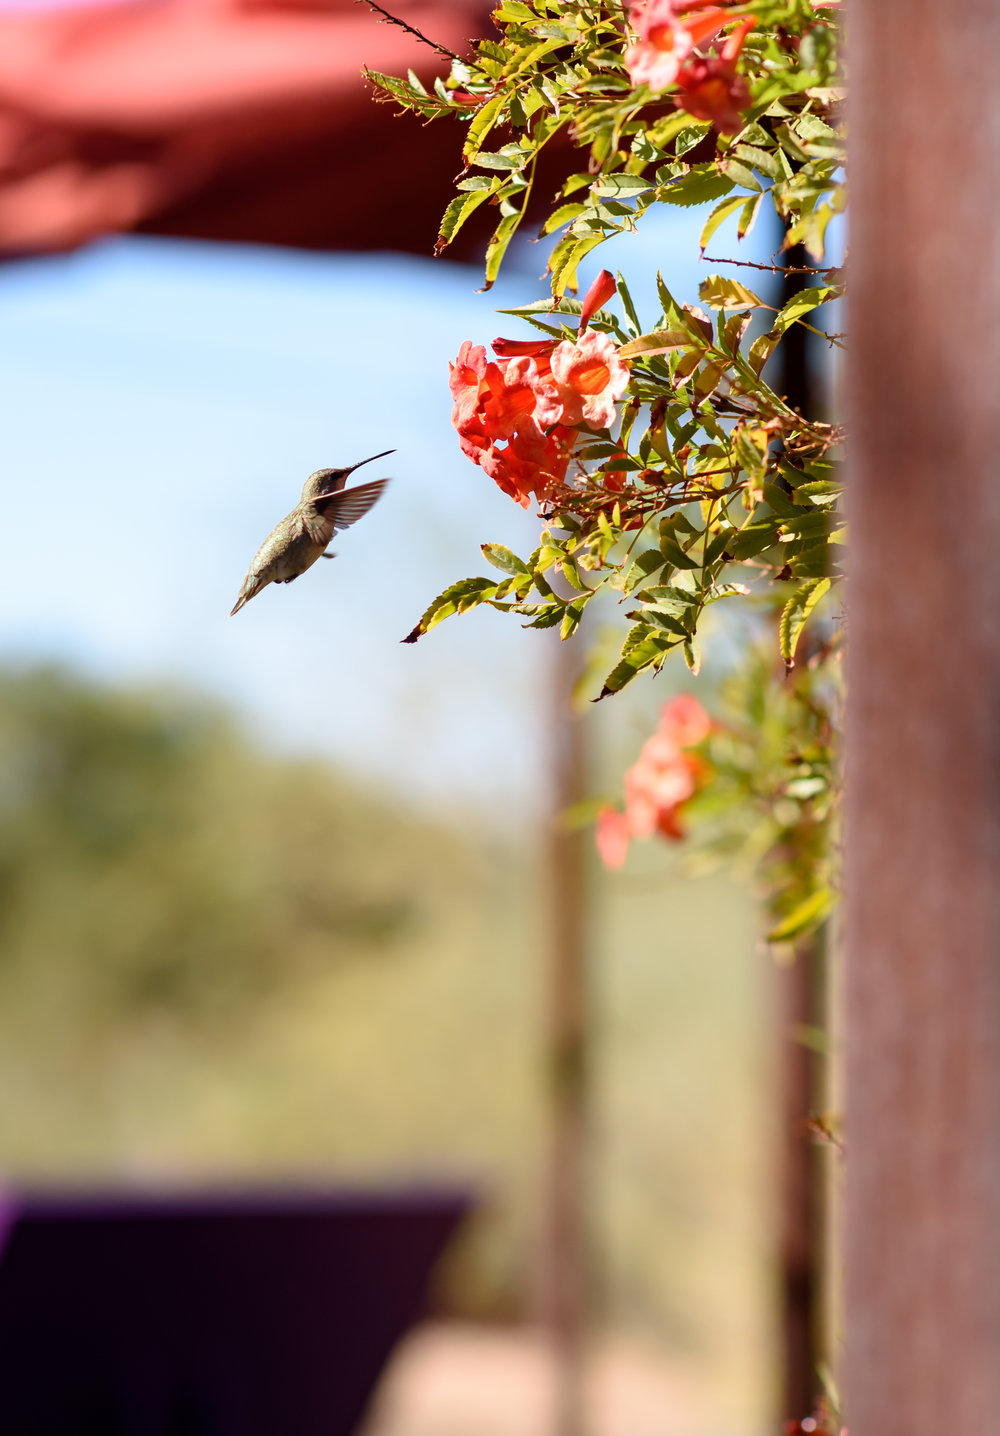 hummingbird phoenix kentucky photographer january june photography